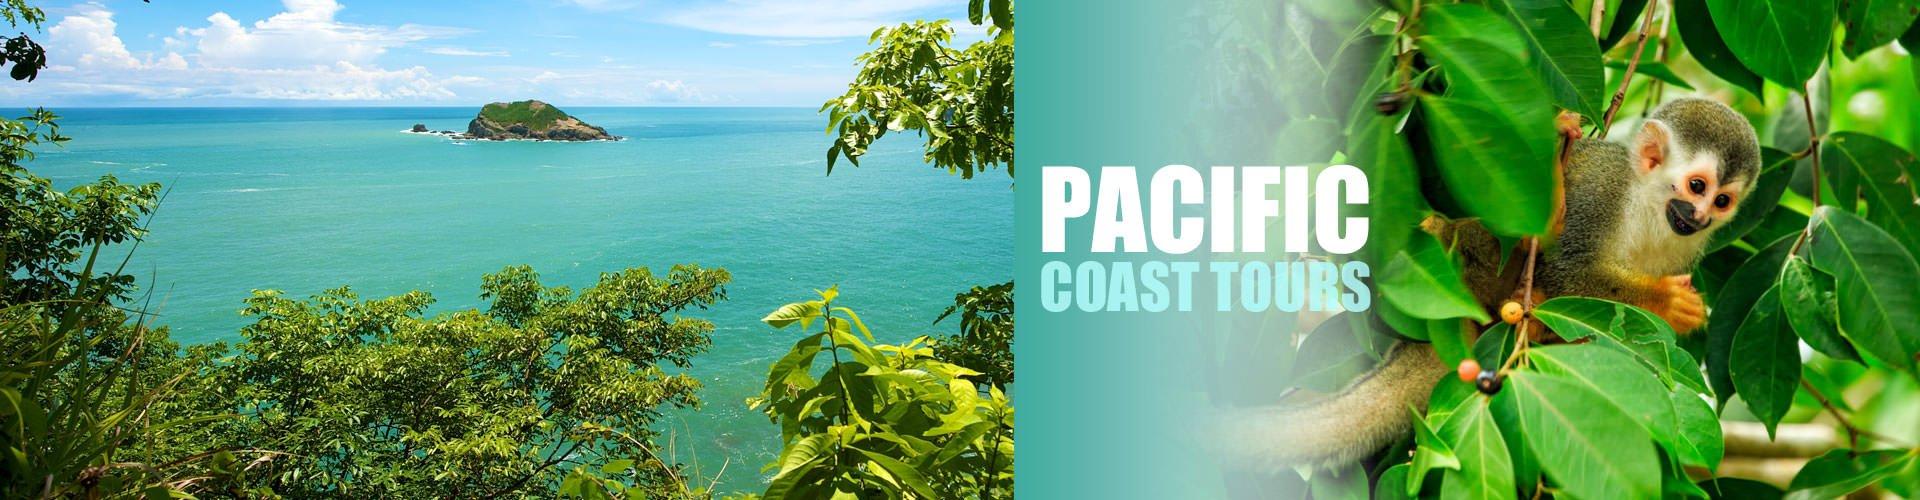 Pacific Coast Tours